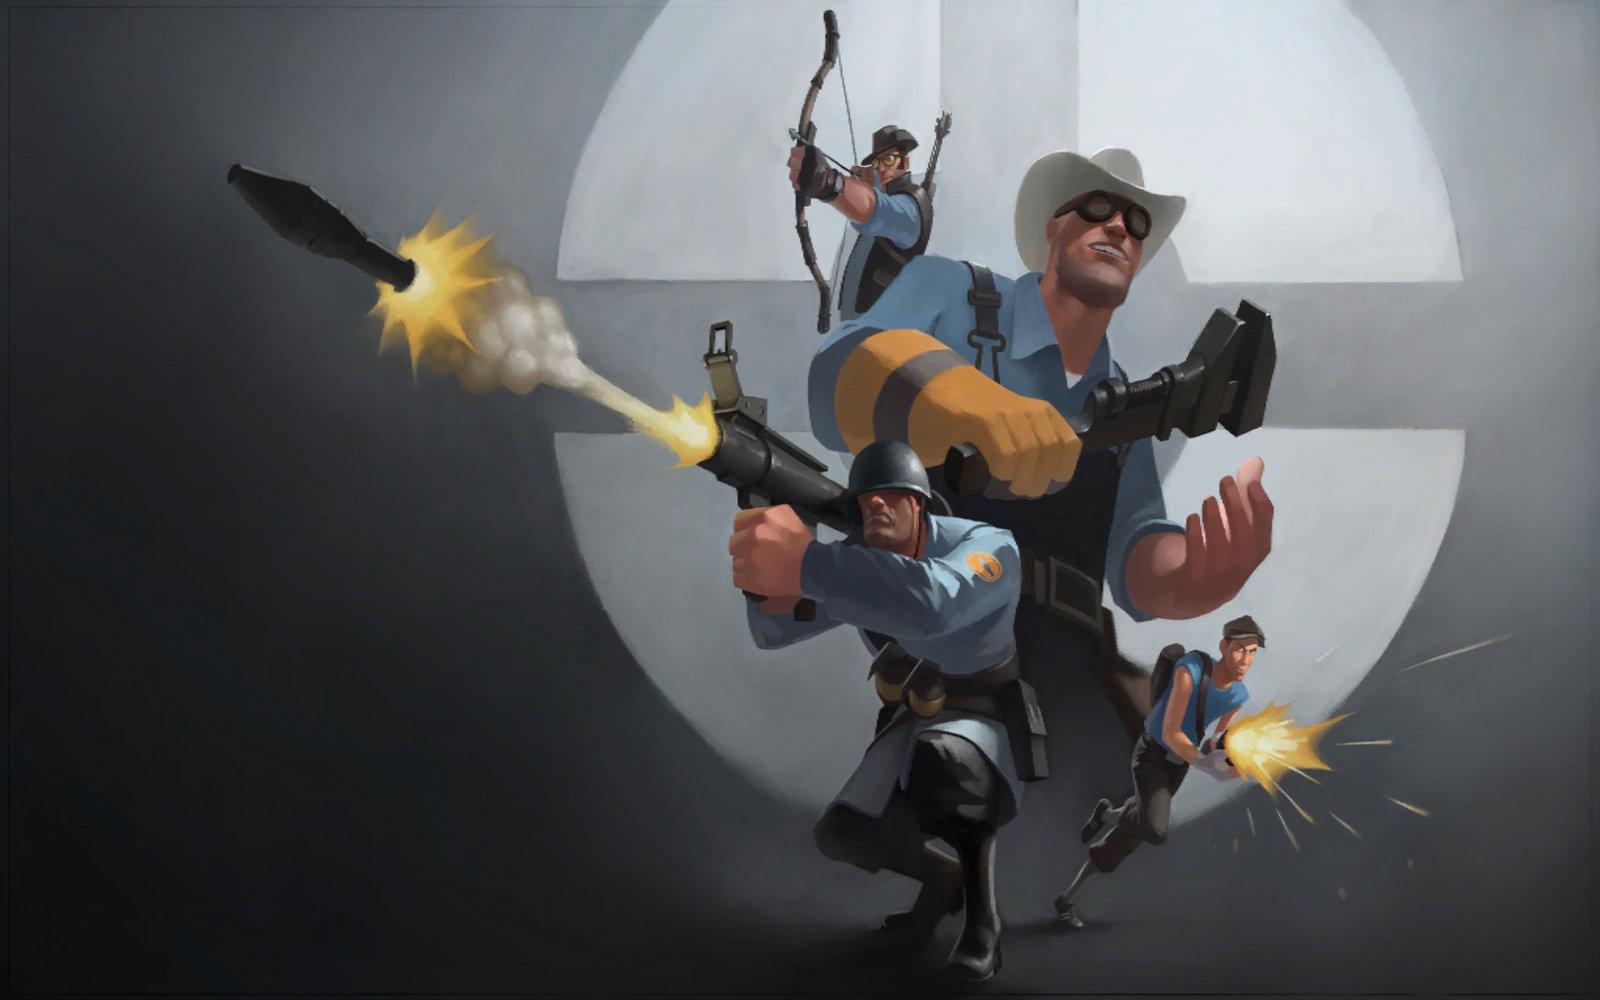 tf2 blu wallpaper by matt2010 fan art wallpaper games 2009 2015 1600x1000